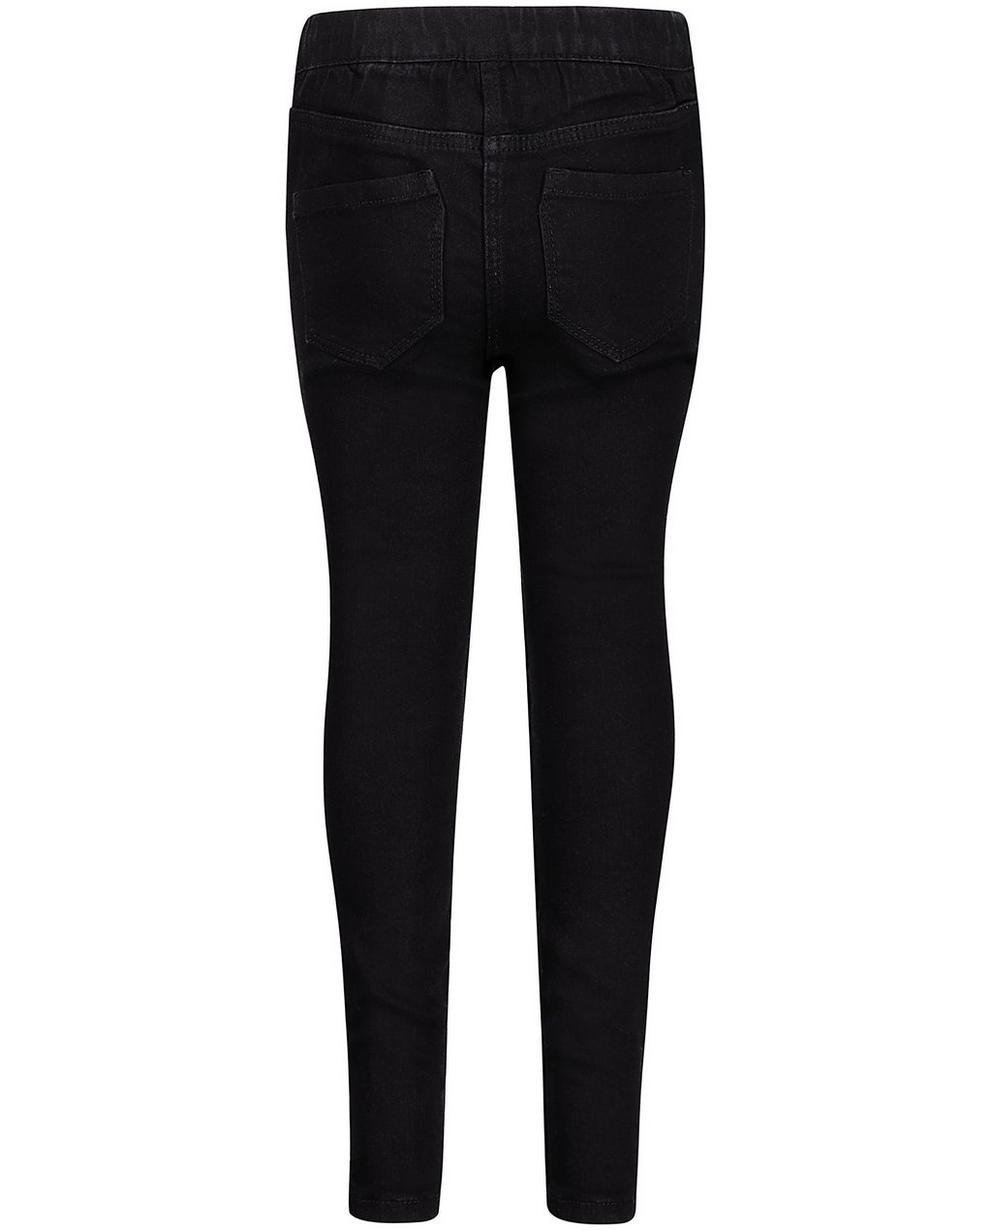 Jeans - black - Jeggings noirs